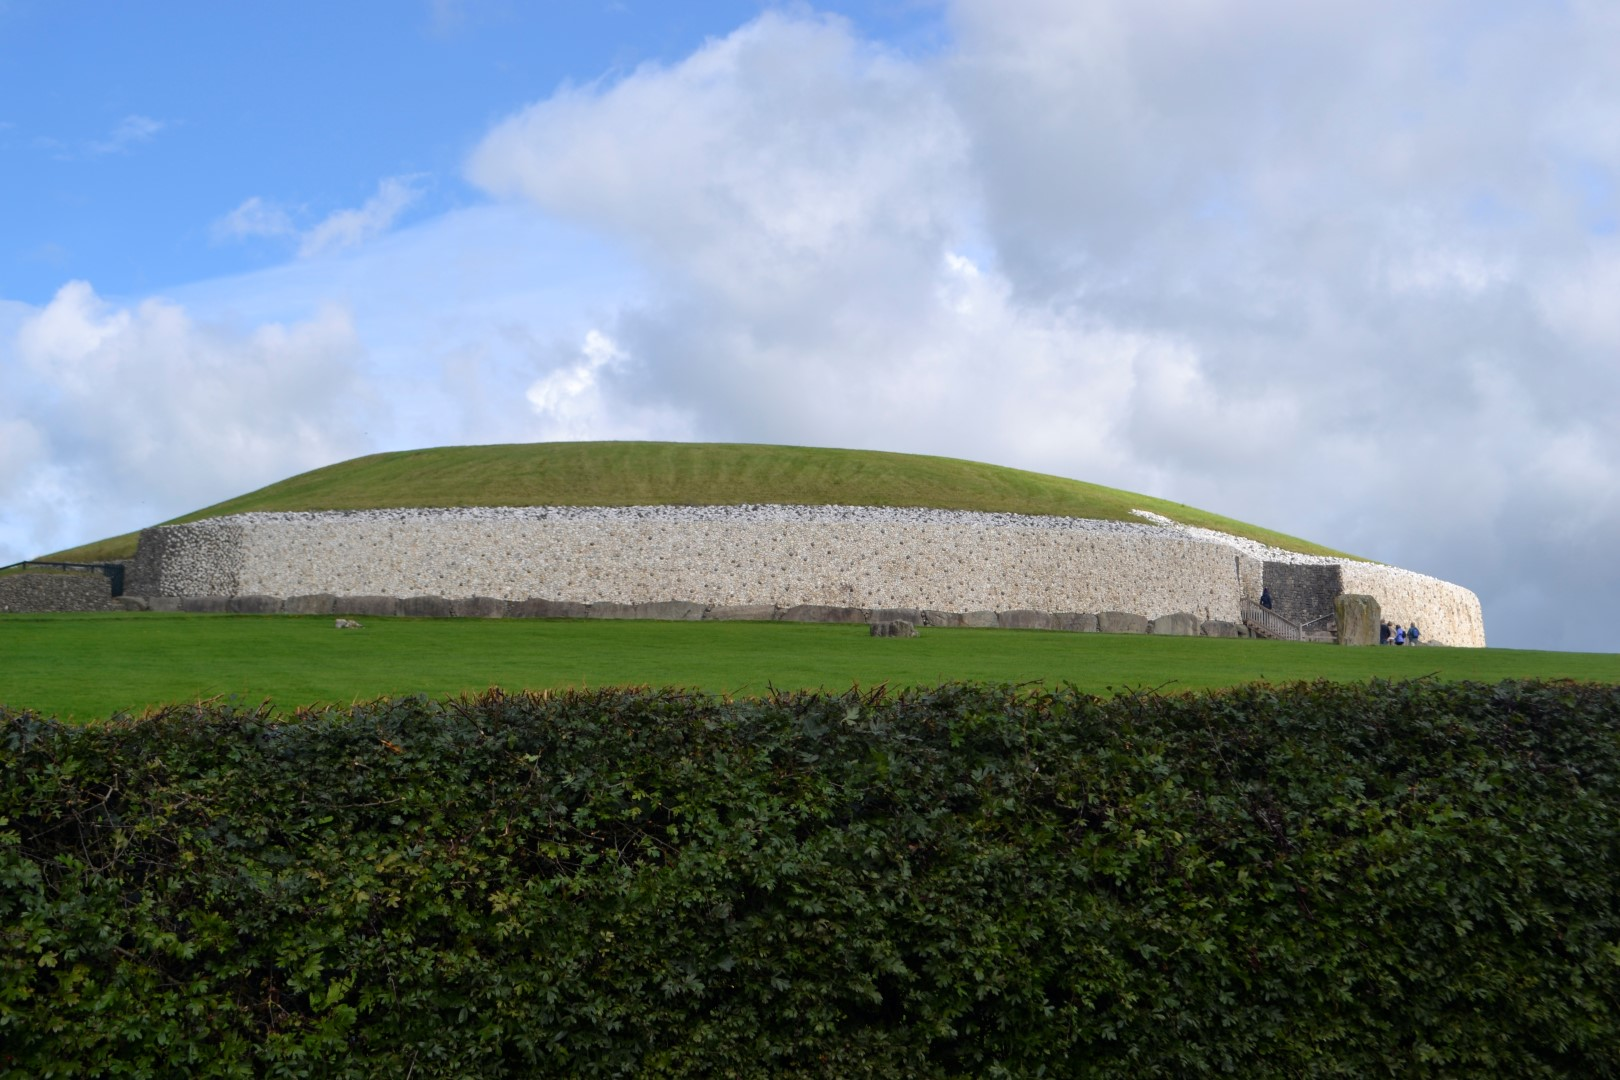 Newgrange Passage Tomb, Bru na Boinne, Ireland (photo: Andy Bruner)